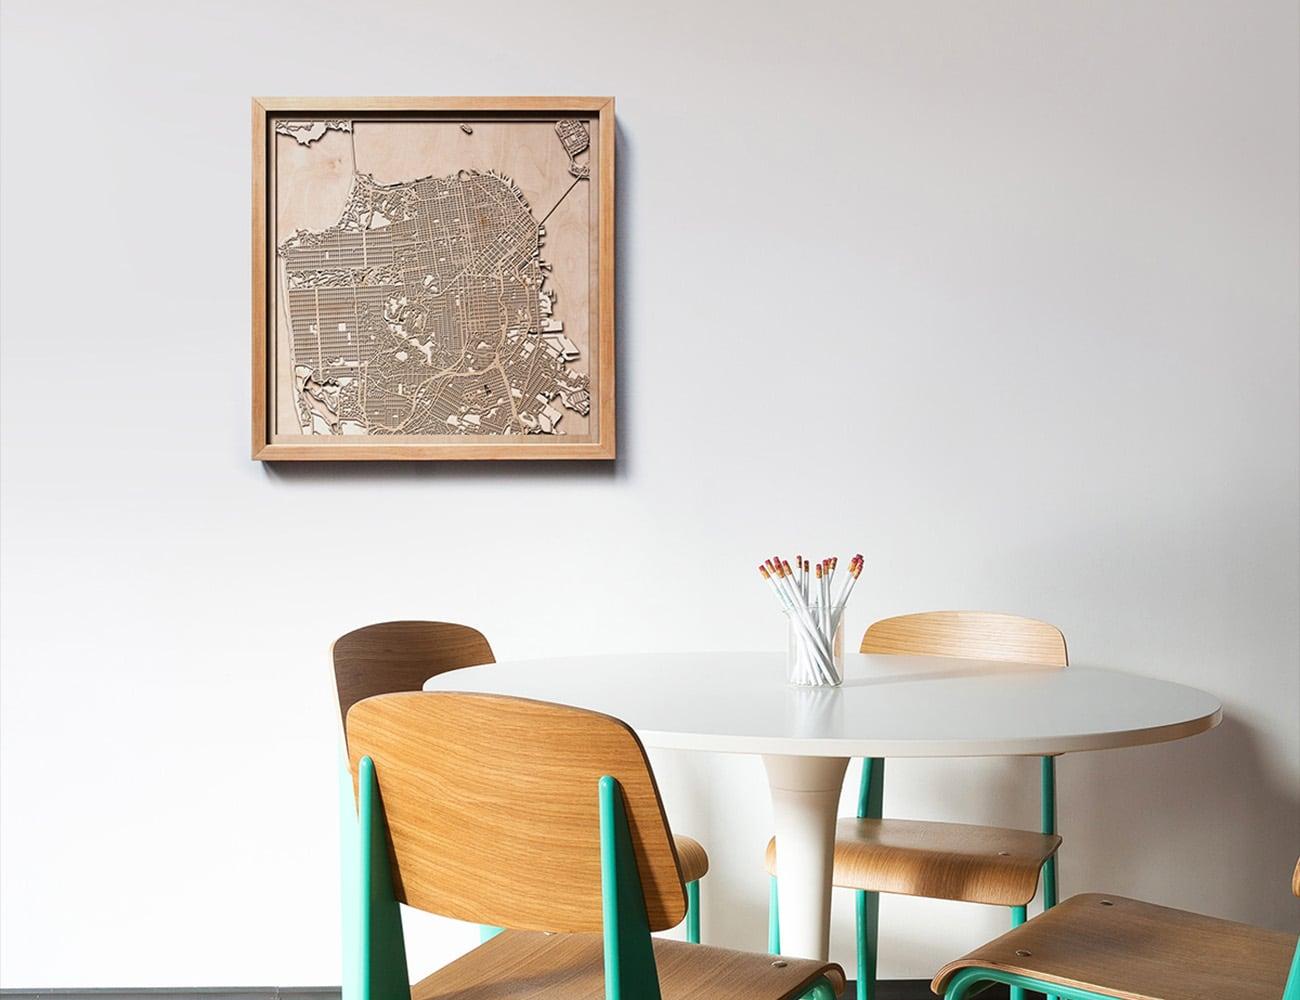 CityWood Minimal 3D Wooden Maps